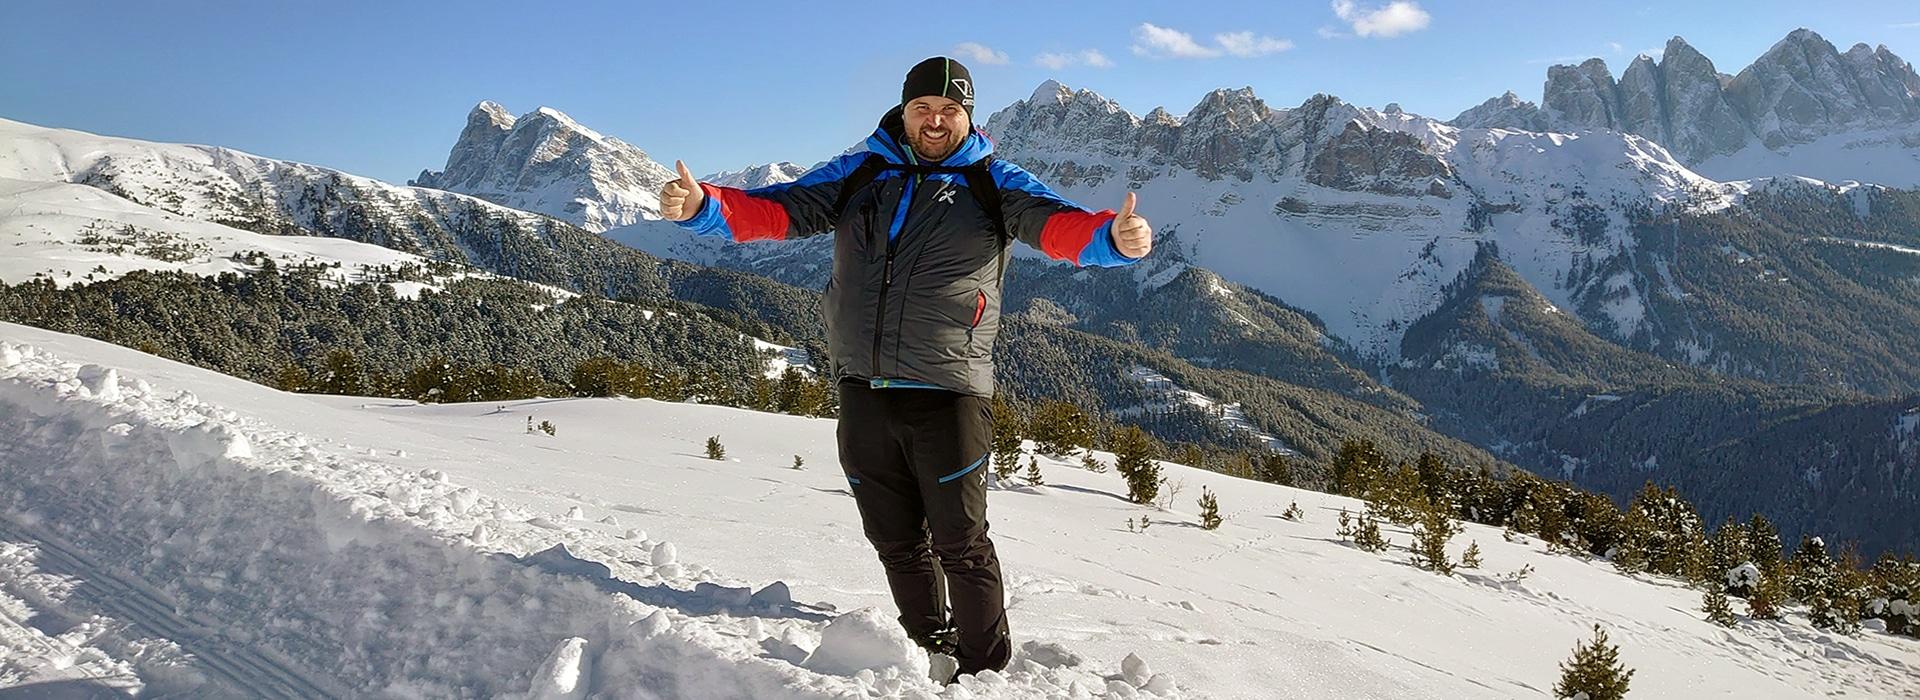 Rossalm – Wandern Plose - Winterwandern Eisacktal - I mog Südtirol – Wandern in Südtirol - Almen in Südtirol – Skigebiet Plose